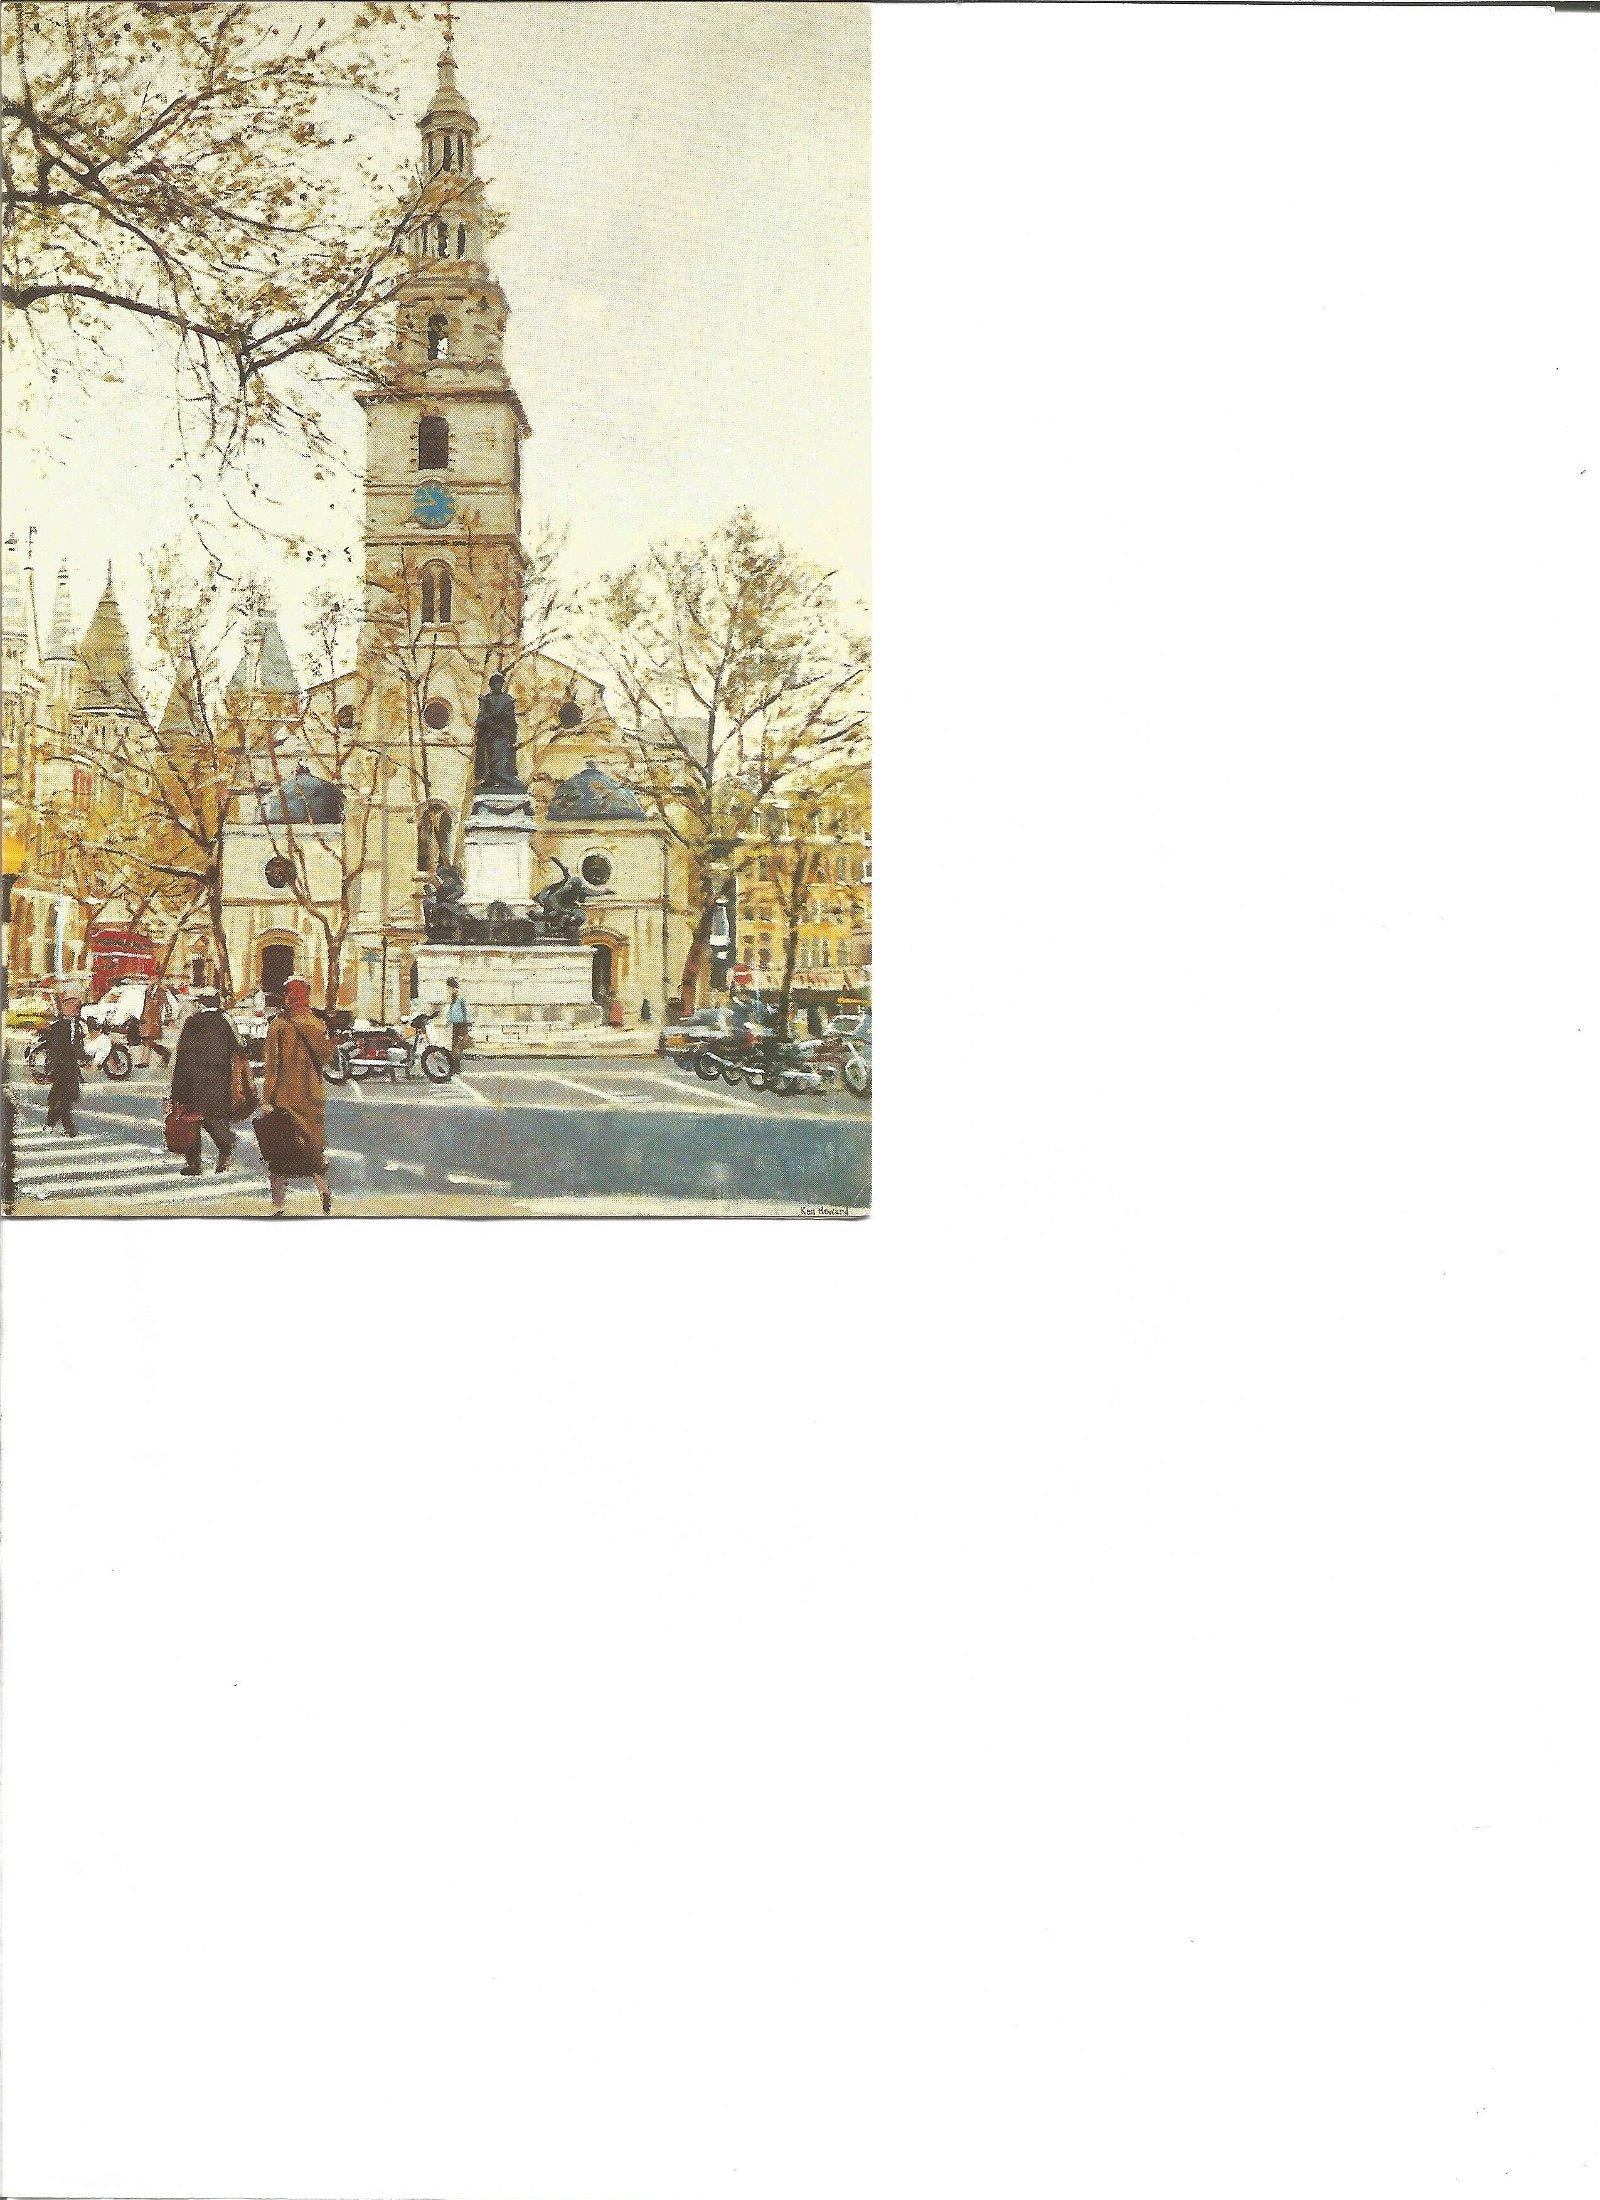 WW2 617 Sqn Mark Flatman signed Christmas card to 617